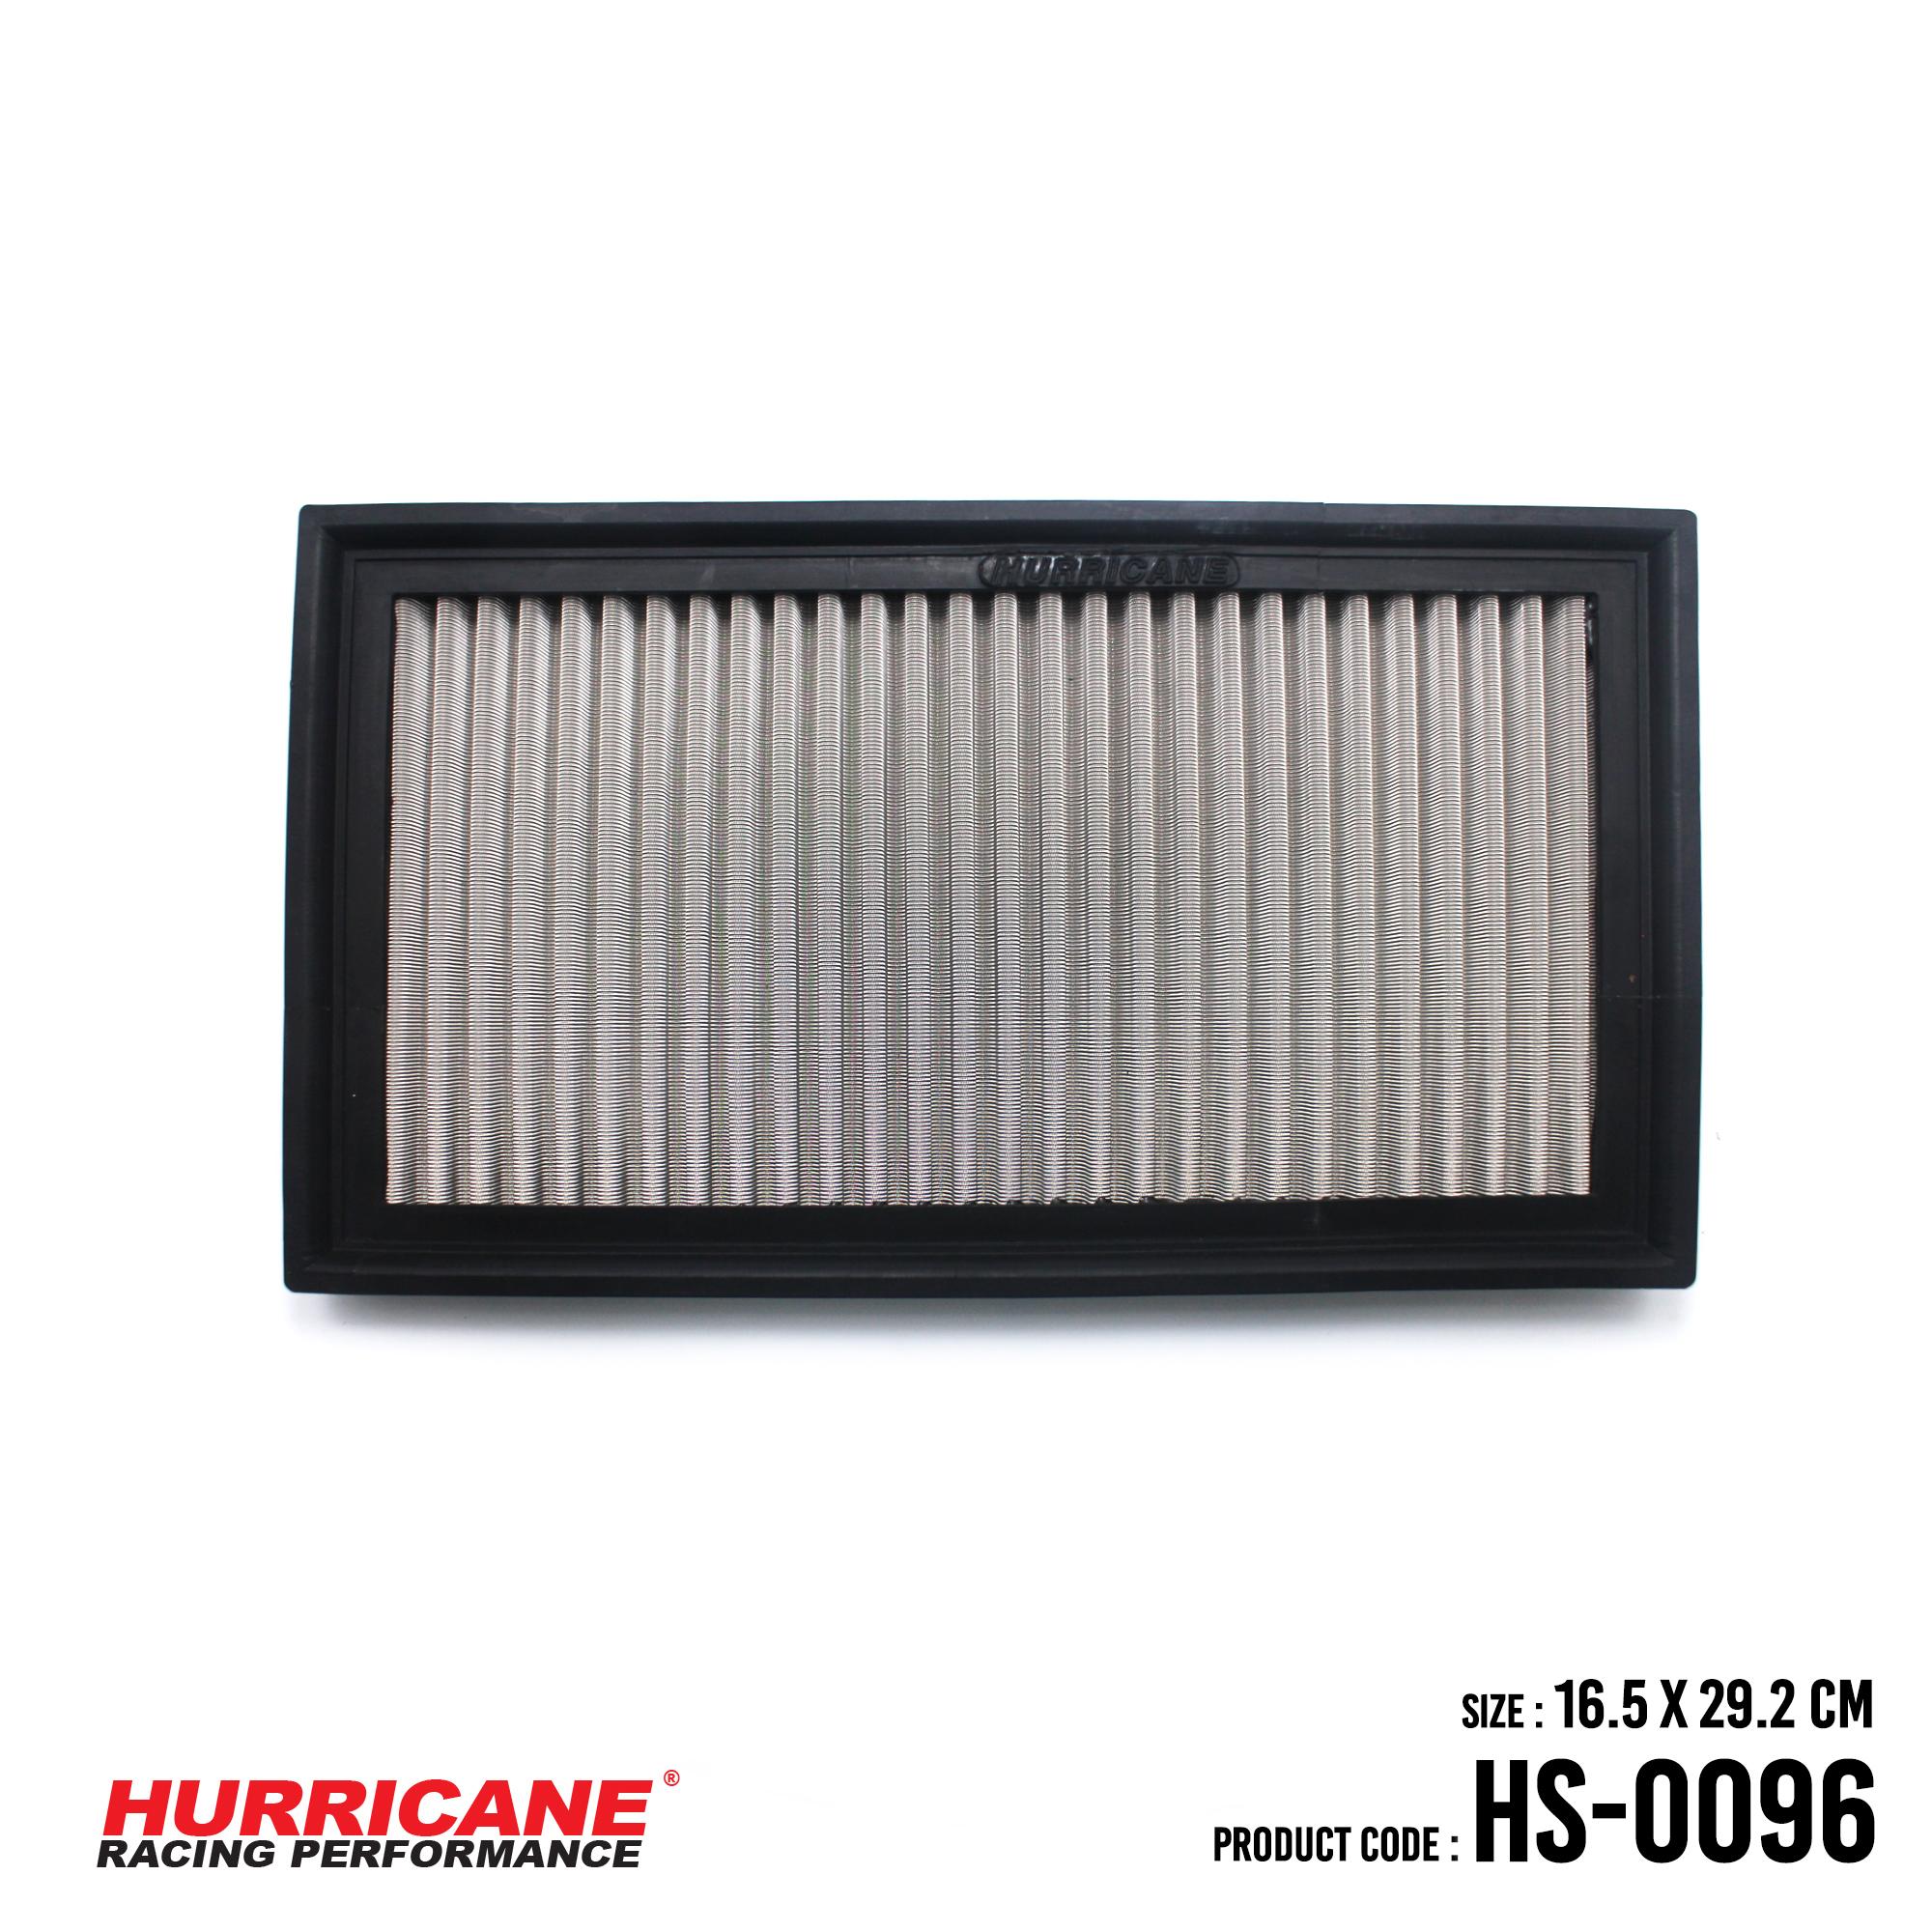 HURRICANE STAINLESS STEEL AIR FILTER FOR HS-0096 MercedesBenz